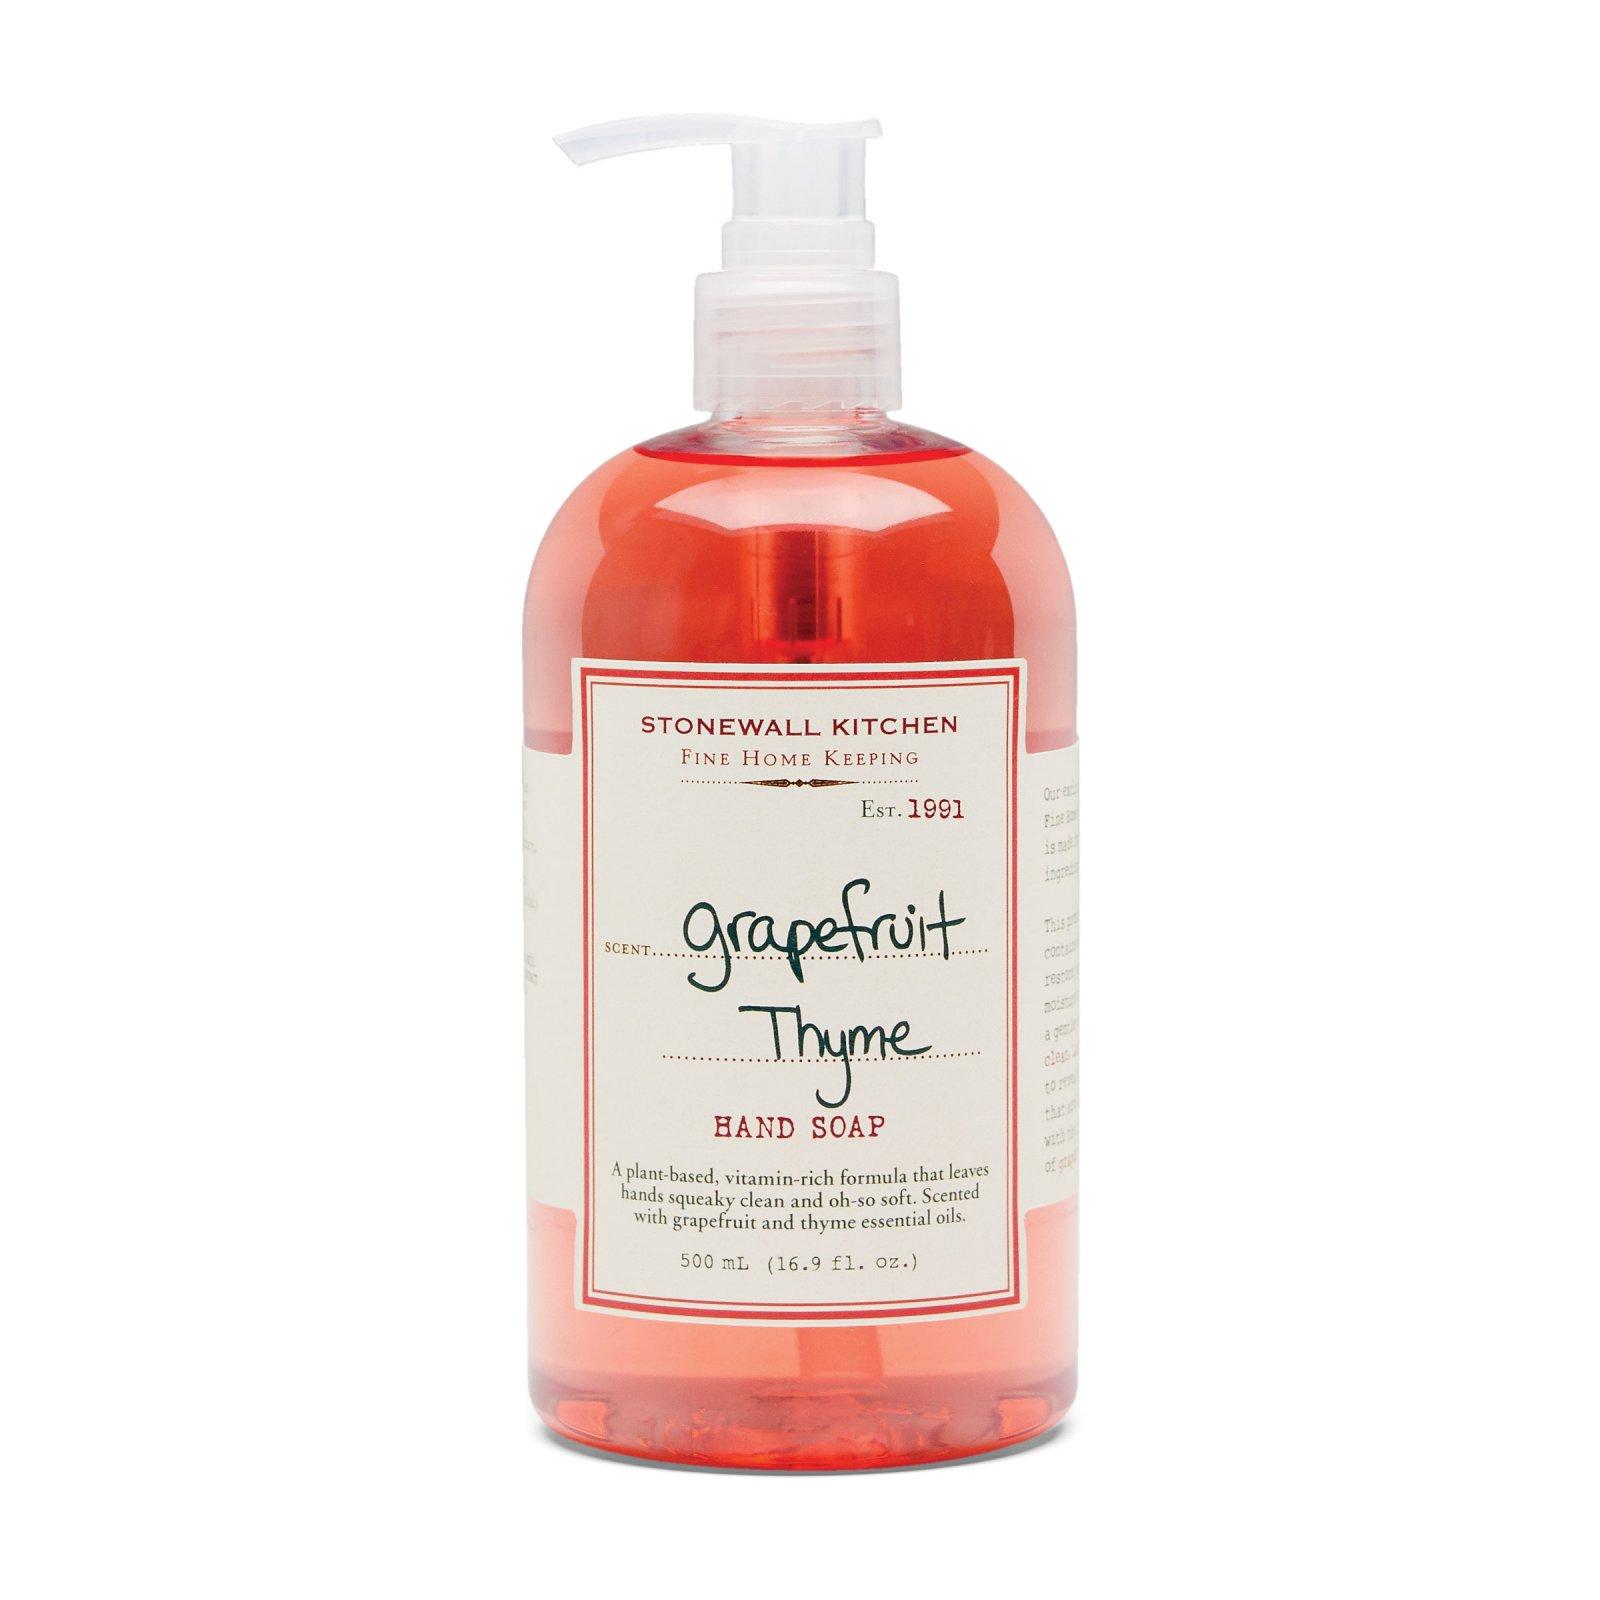 Stonewall Kitchen Hand Soap